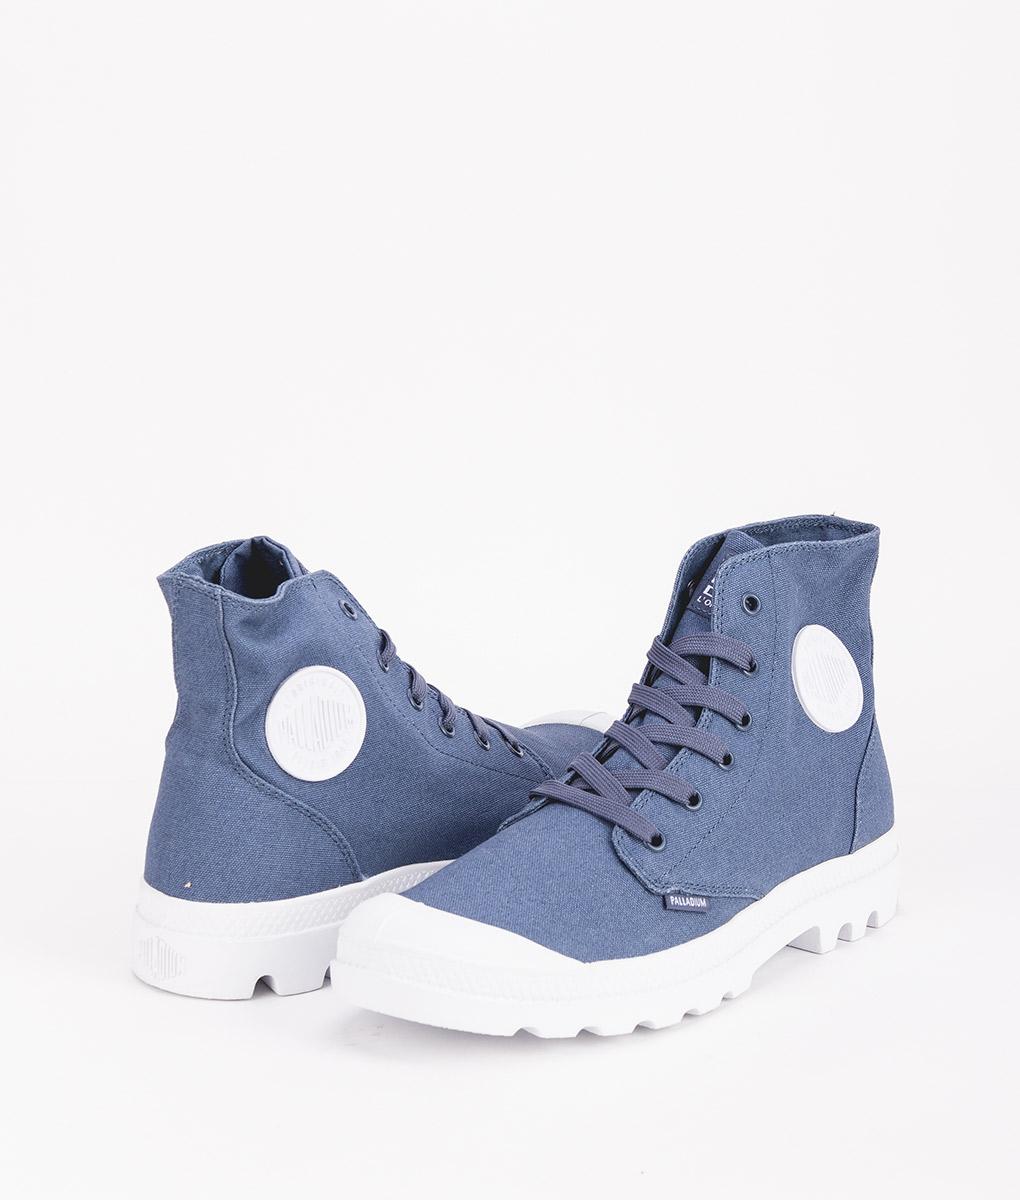 PALLADIUM Men Sneakers 72886 BLANC HI, Vintage Indigo 69.99